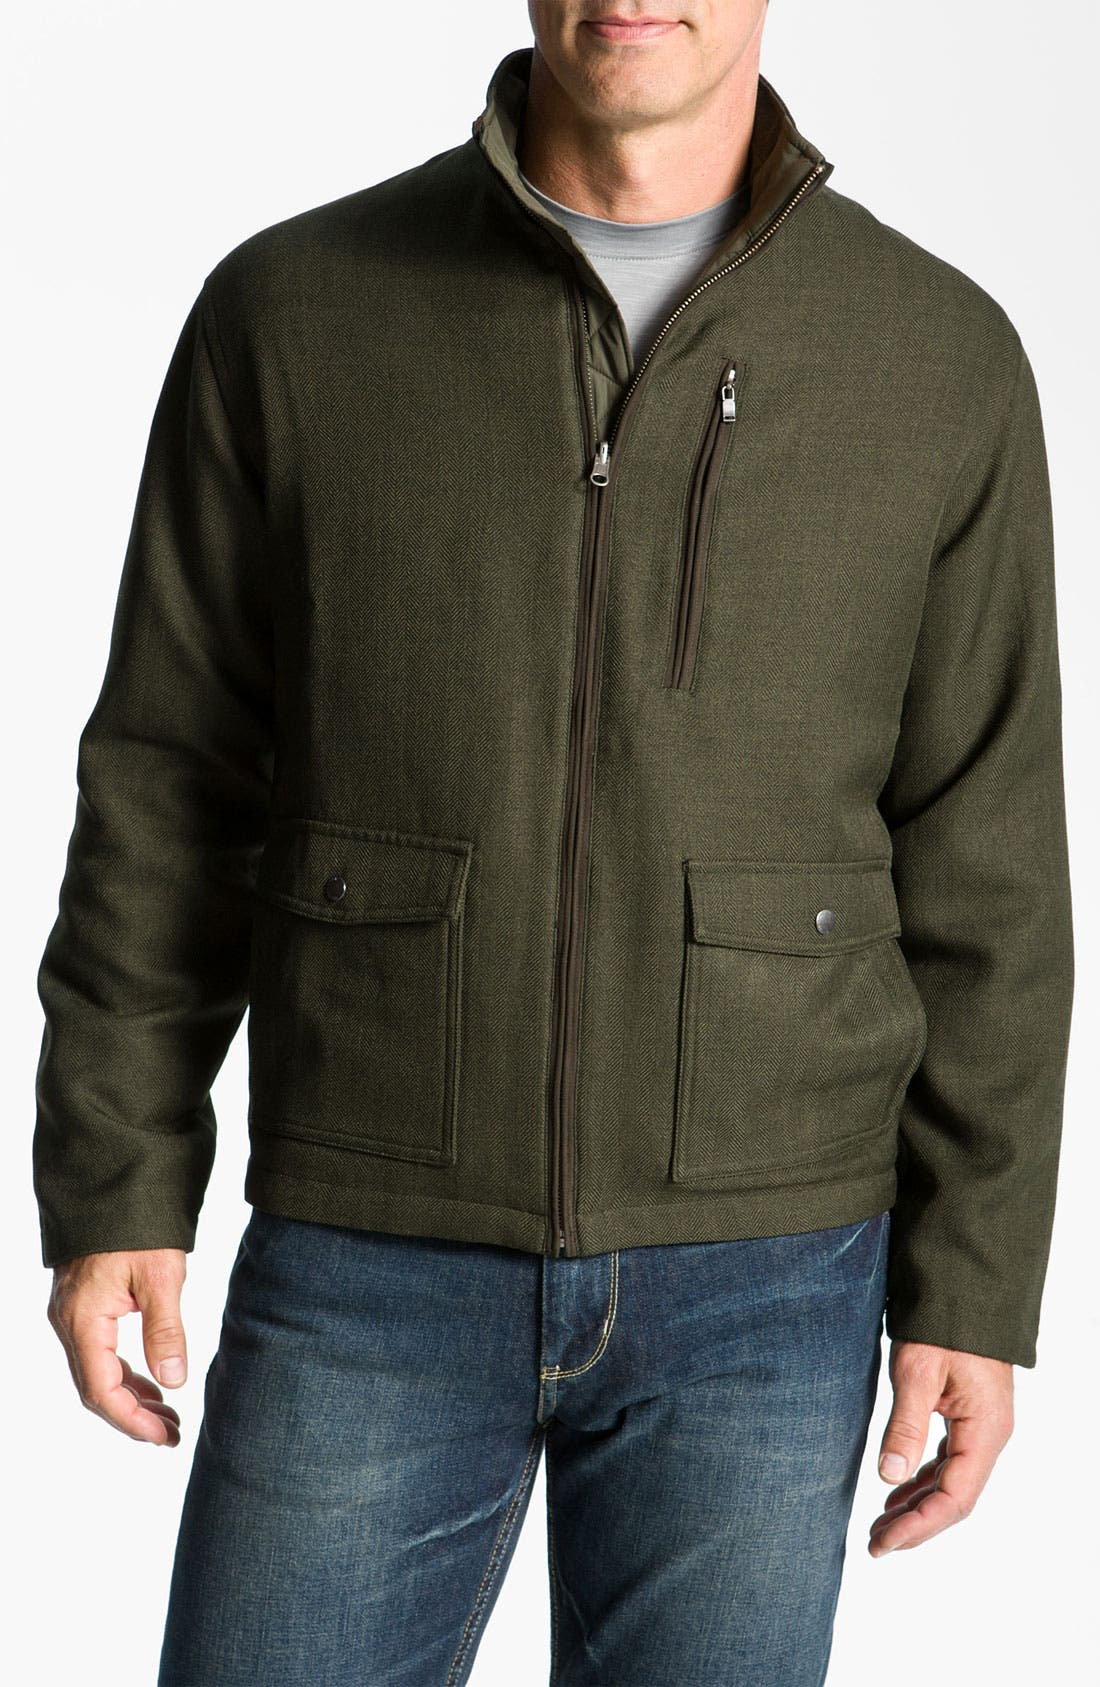 Main Image - Cutter & Buck 'Weathertec Bearsden' Reversible Jacket (Big & Tall)